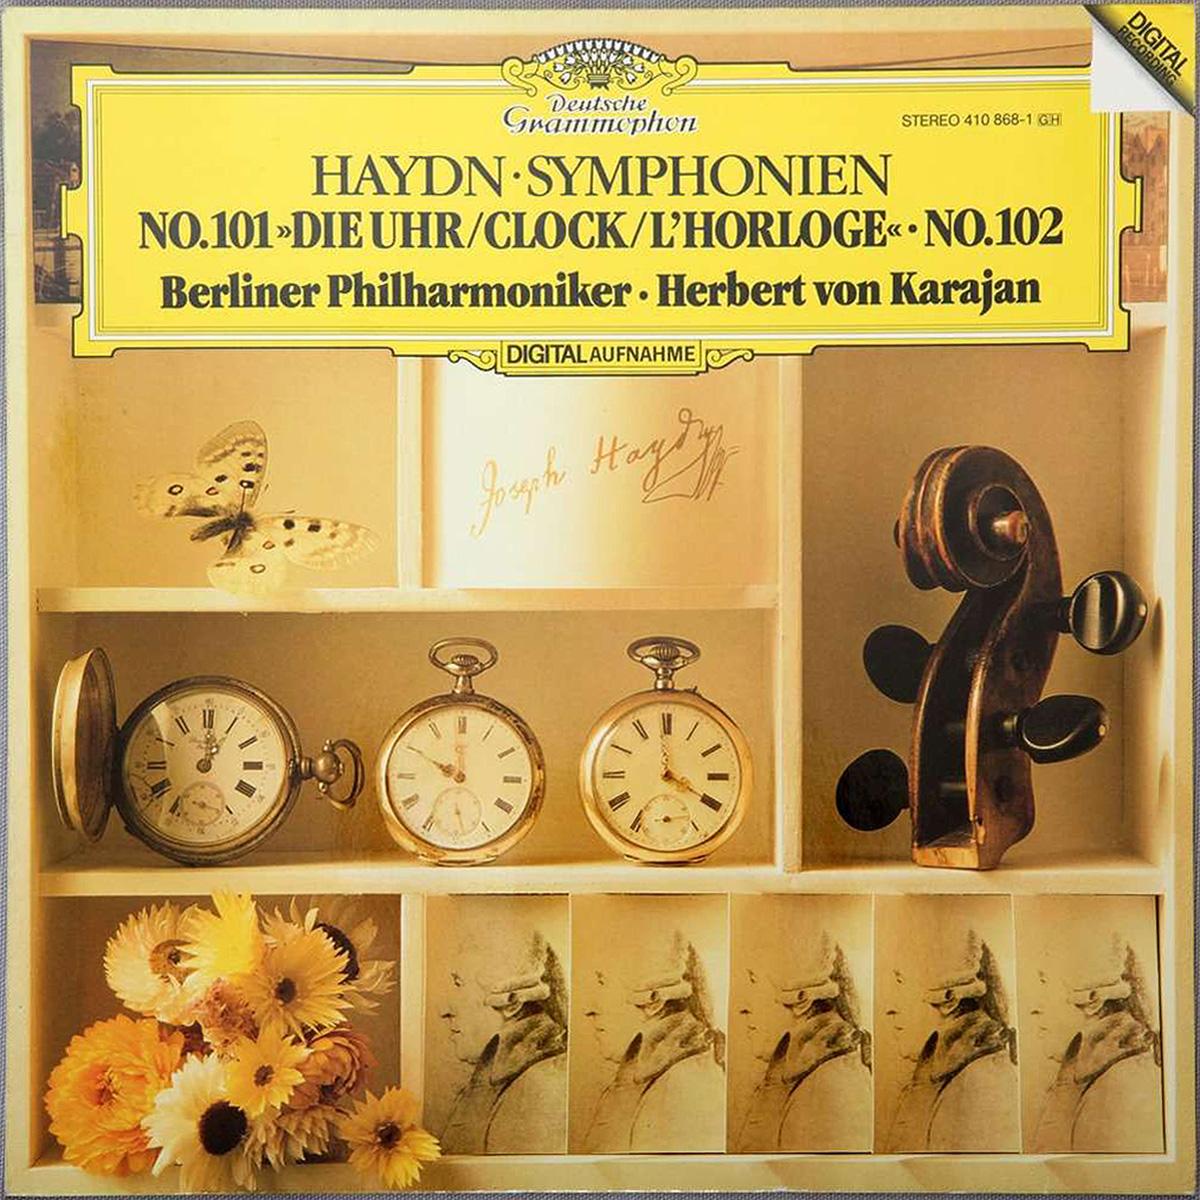 DGG 410 868 Haydn Symphonies 101 & 102 Karajan DGG Digital Aufnahme